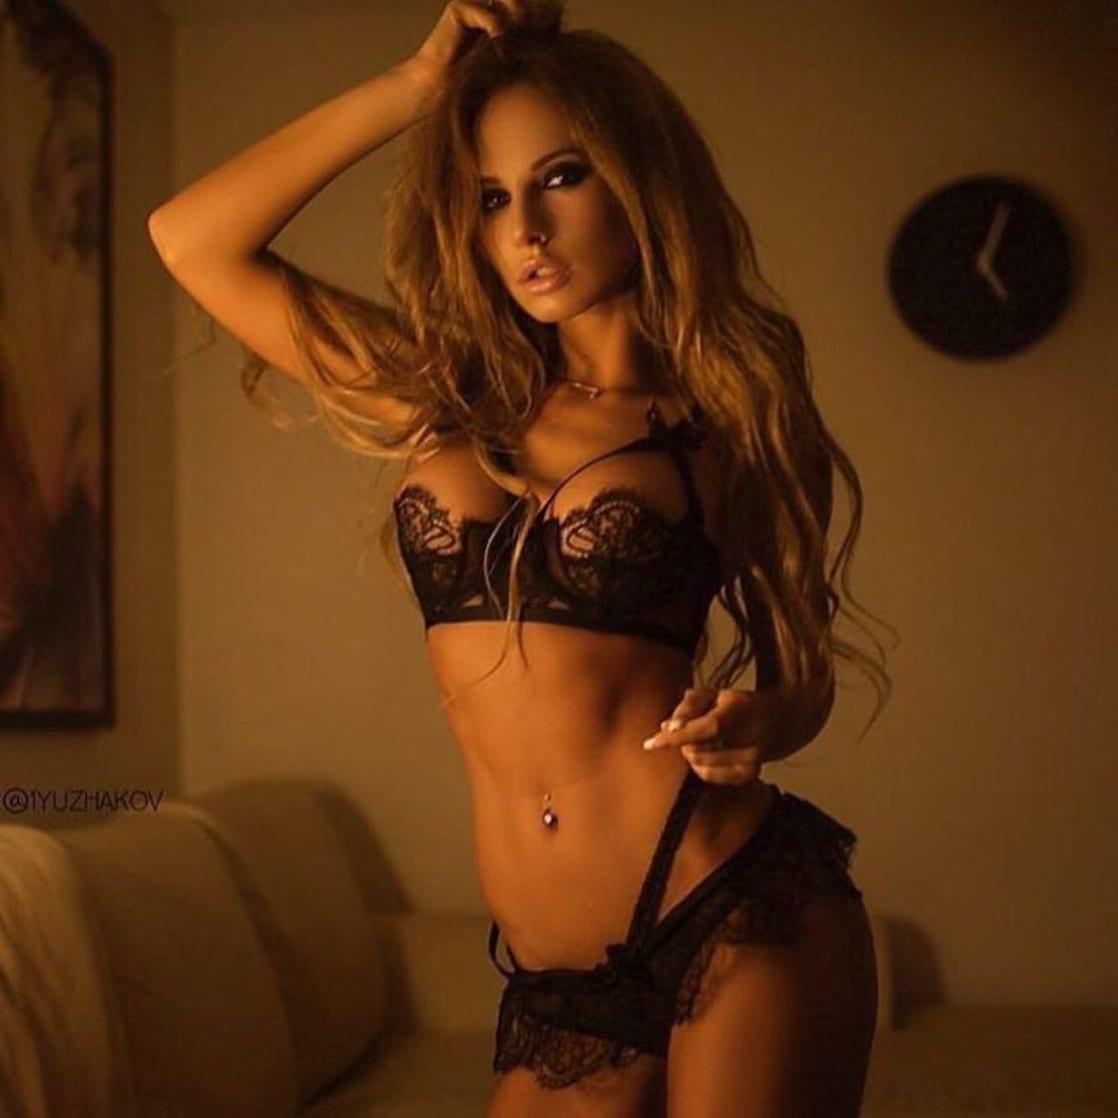 Bikini Katerina Rubinovich nude photos 2019